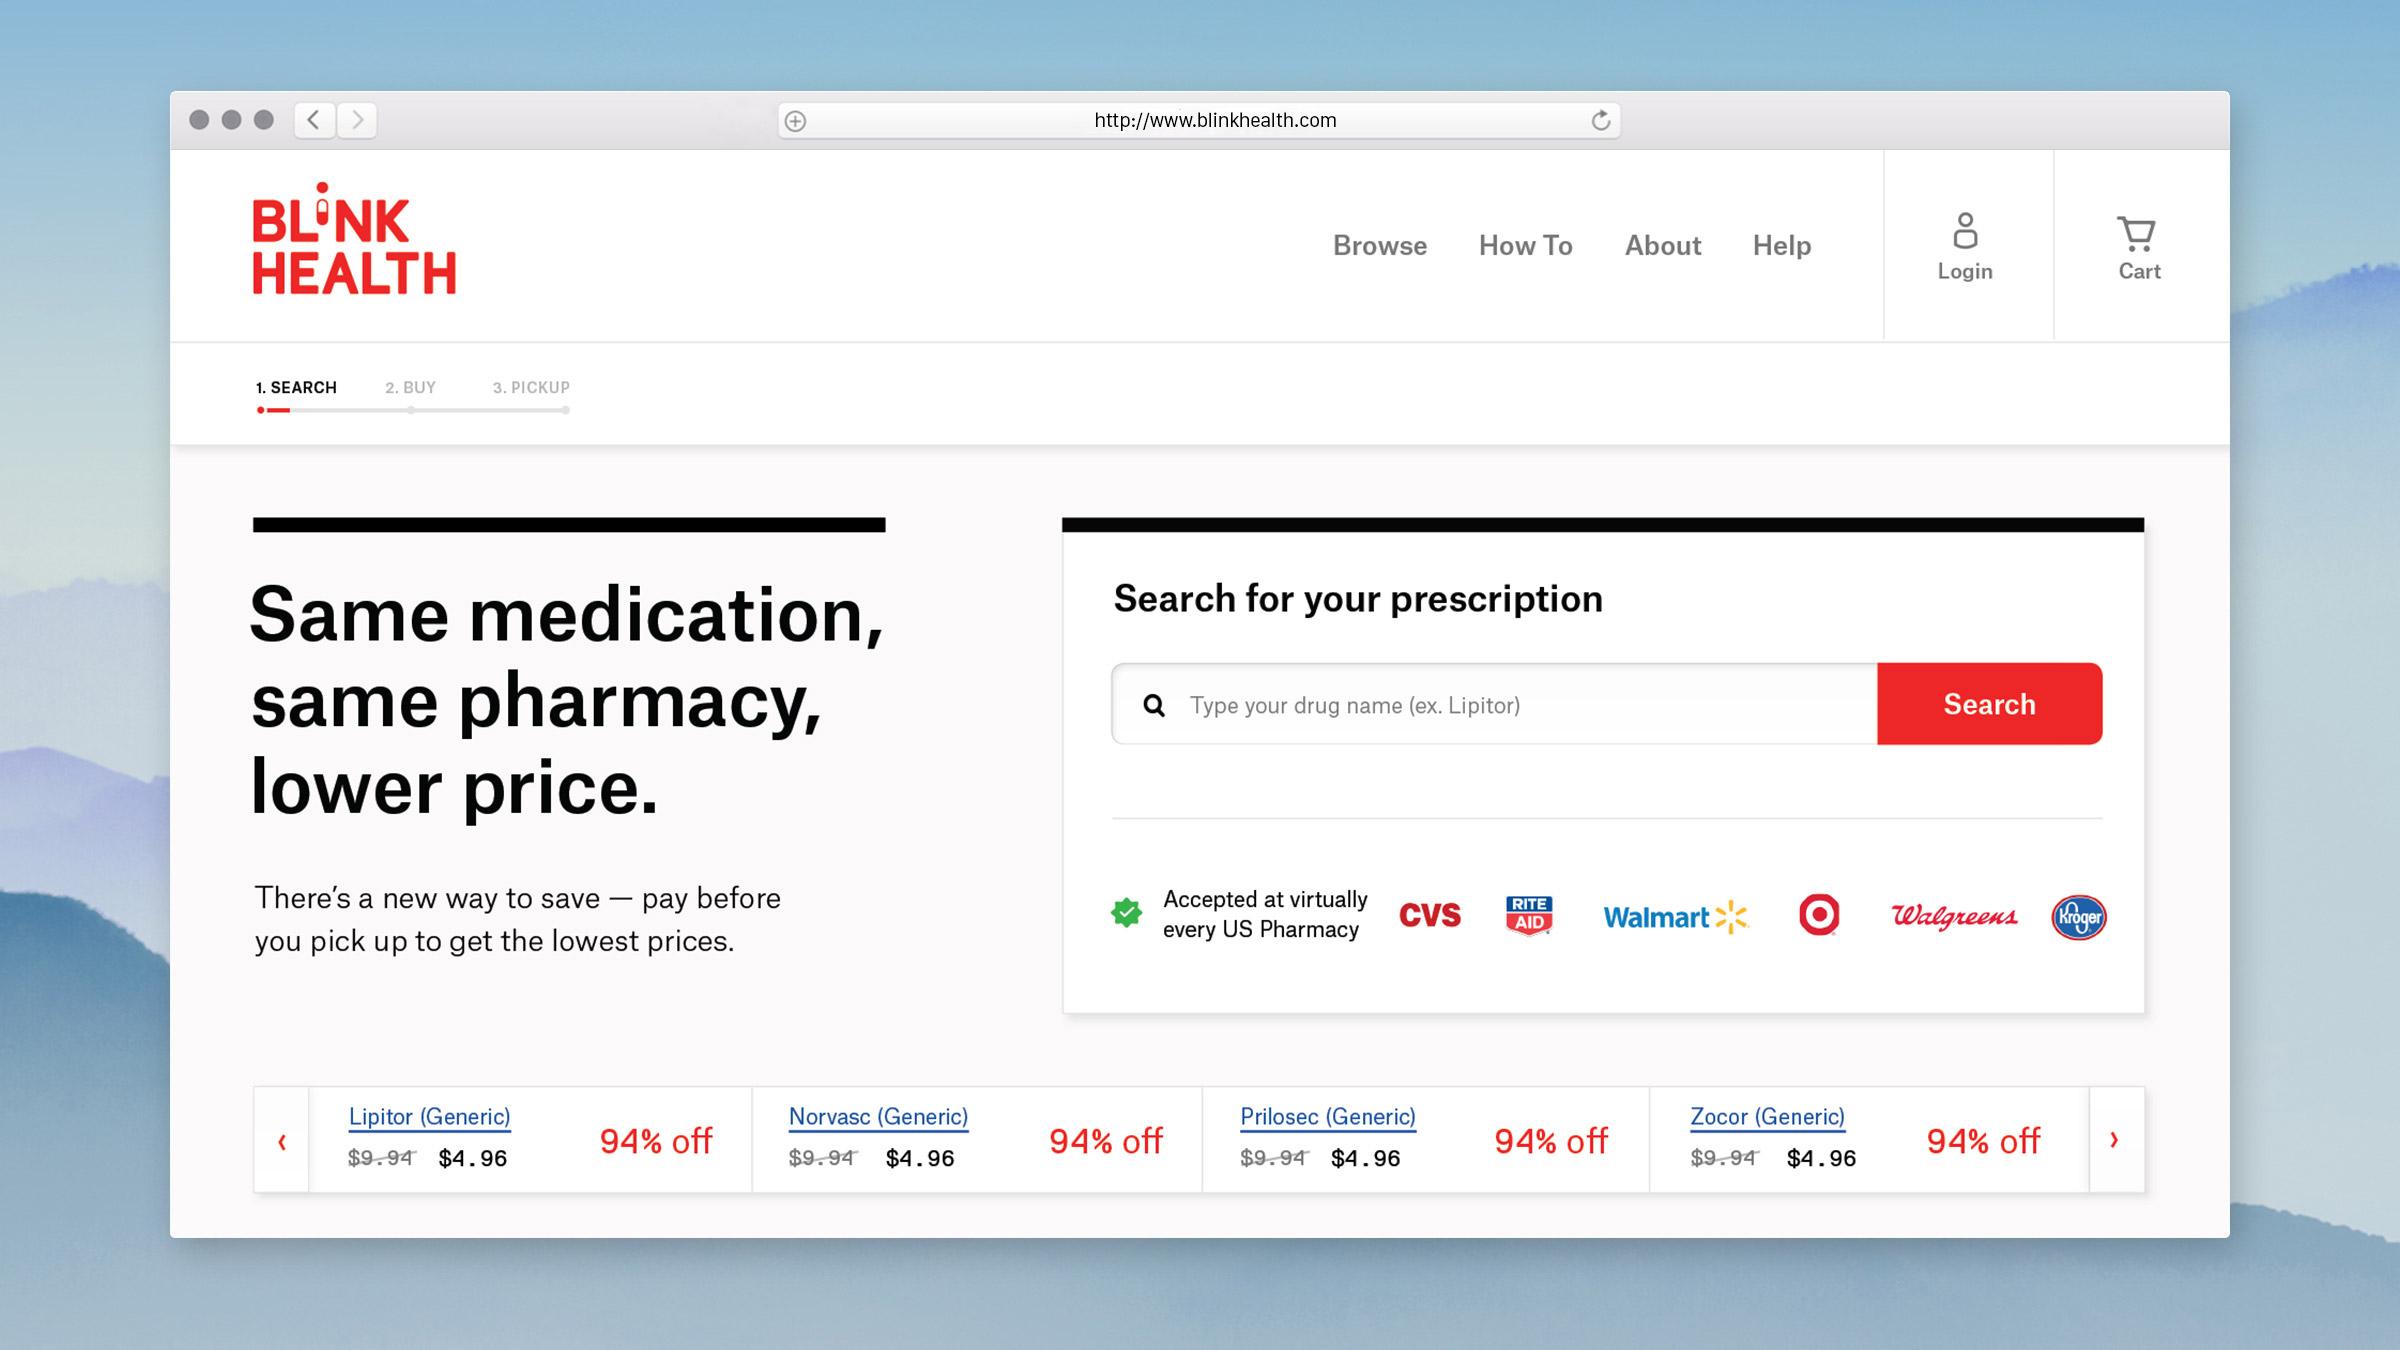 Web Design for Blink Health - Homepage